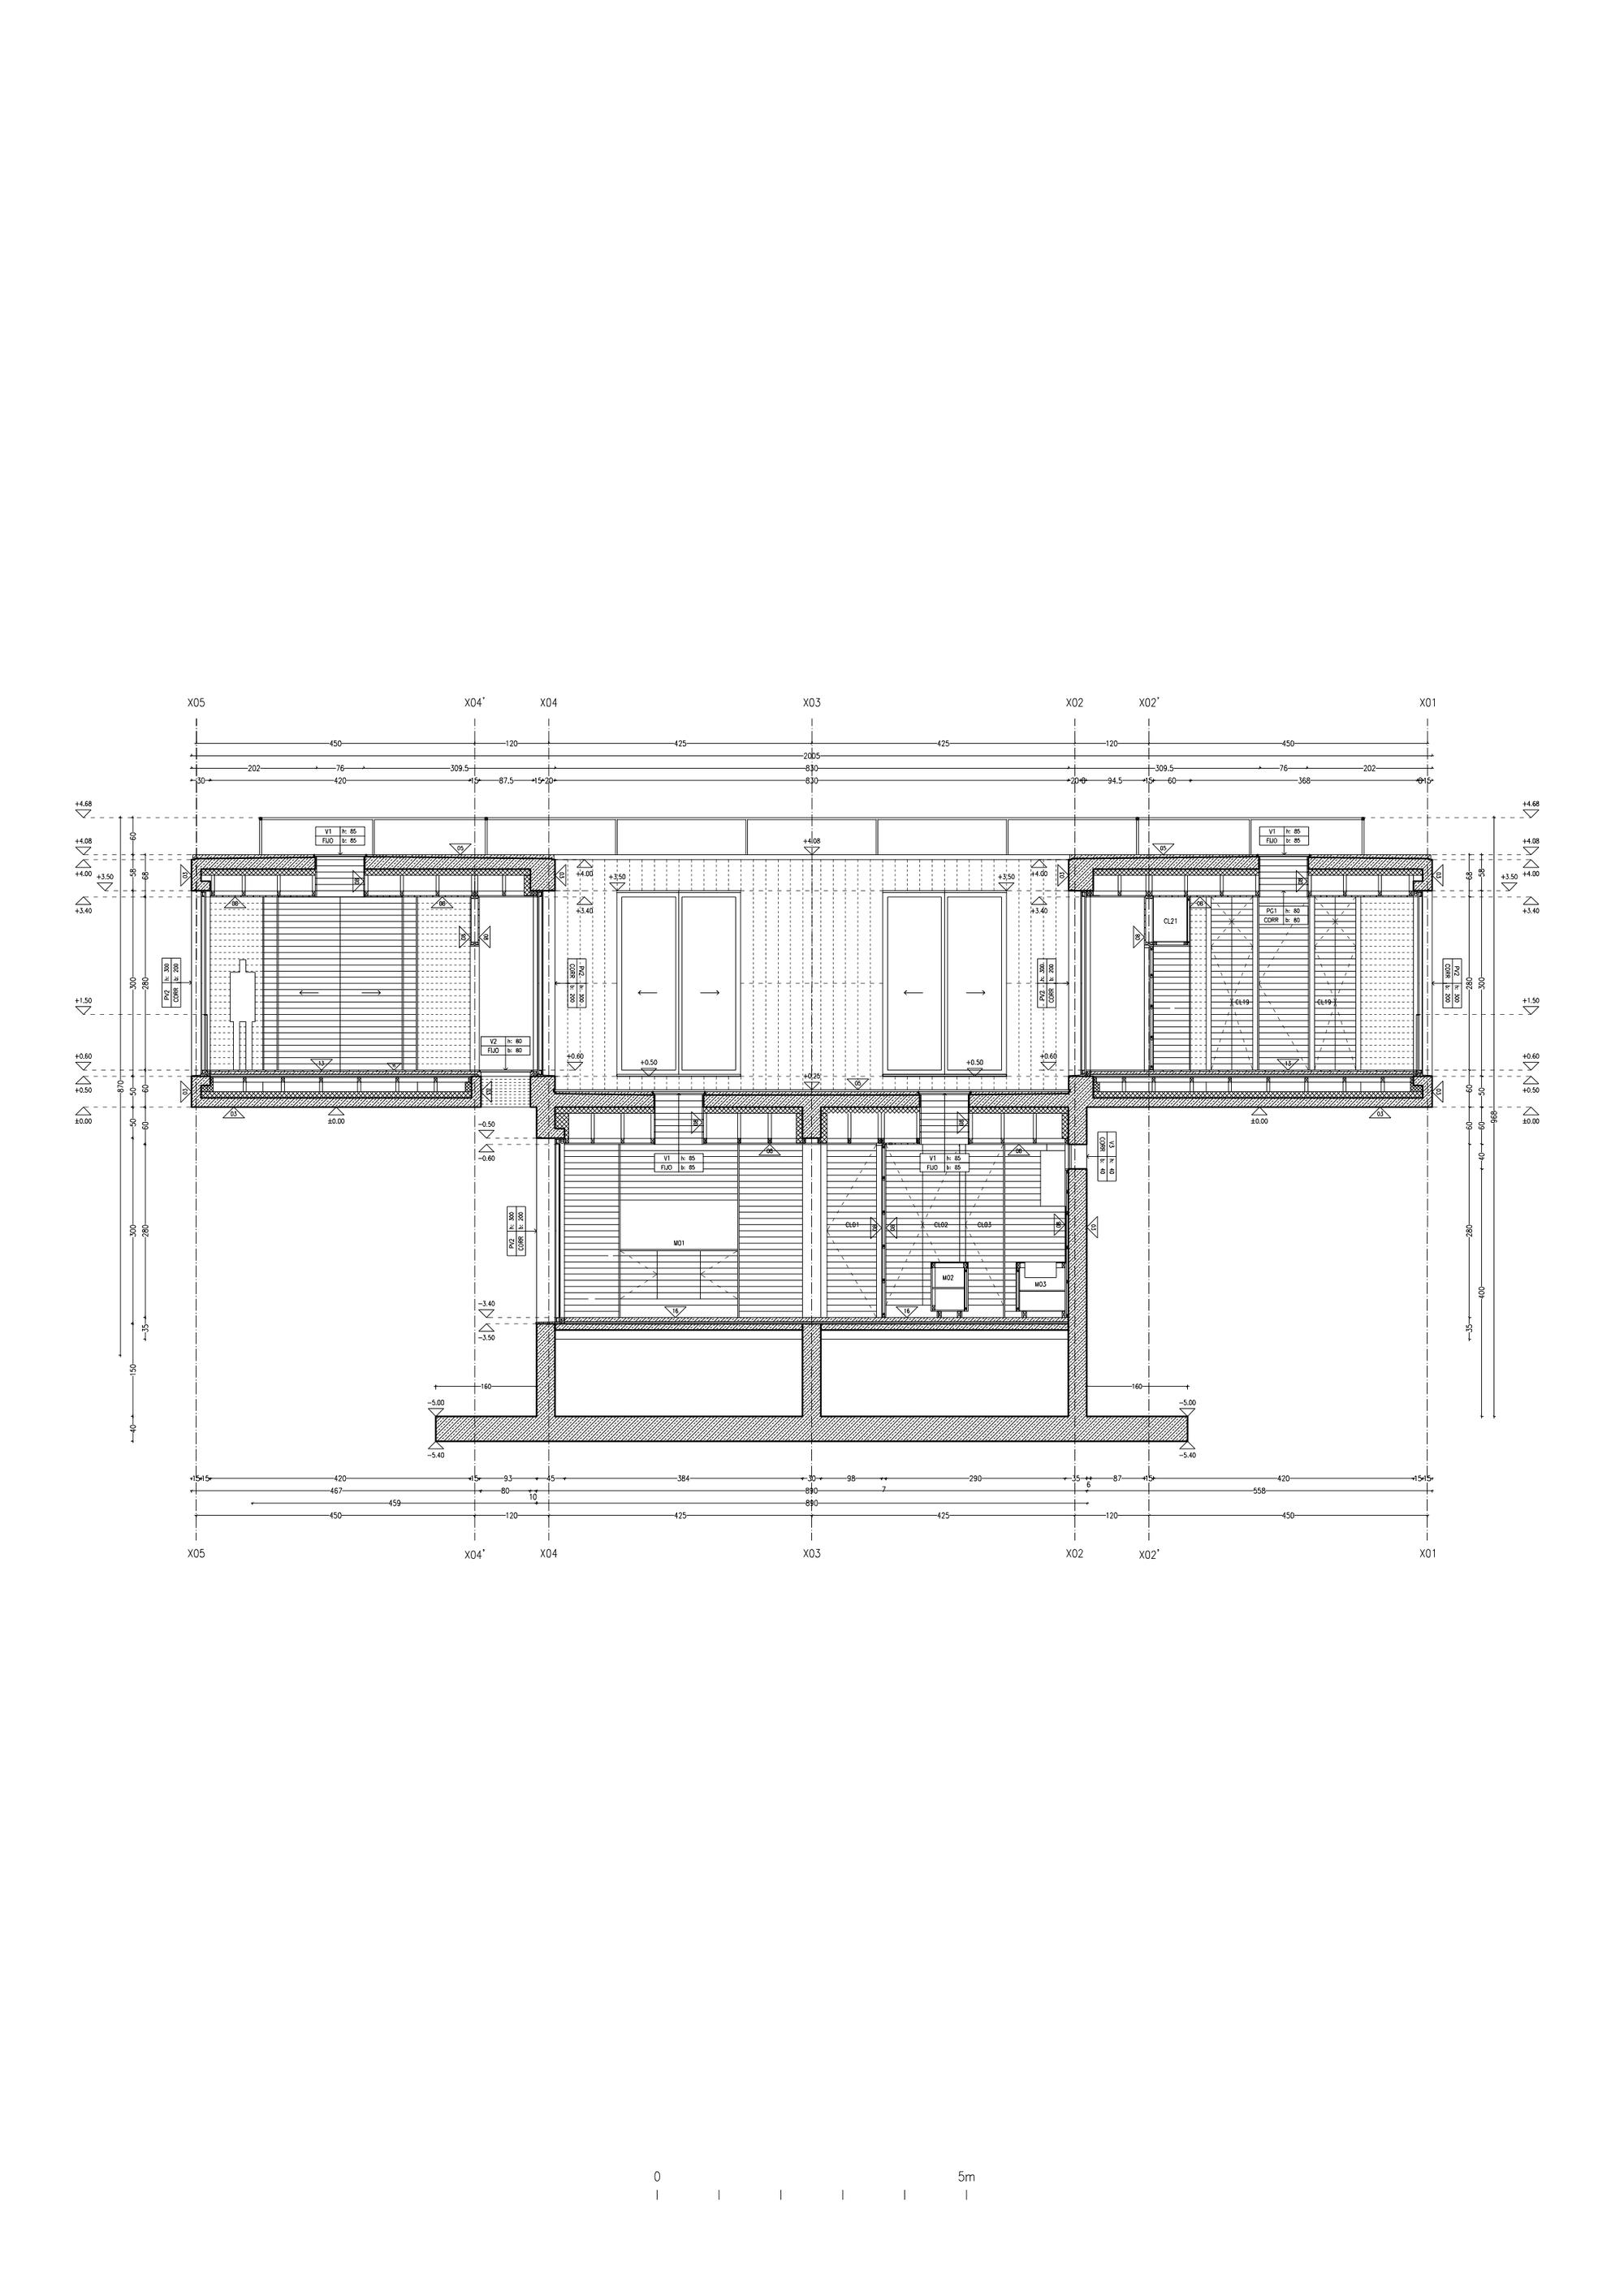 54aaf793e58ecec5300000c9_guna-house-pezo-von-ellrichshausen_pve_guna_09_constr_section